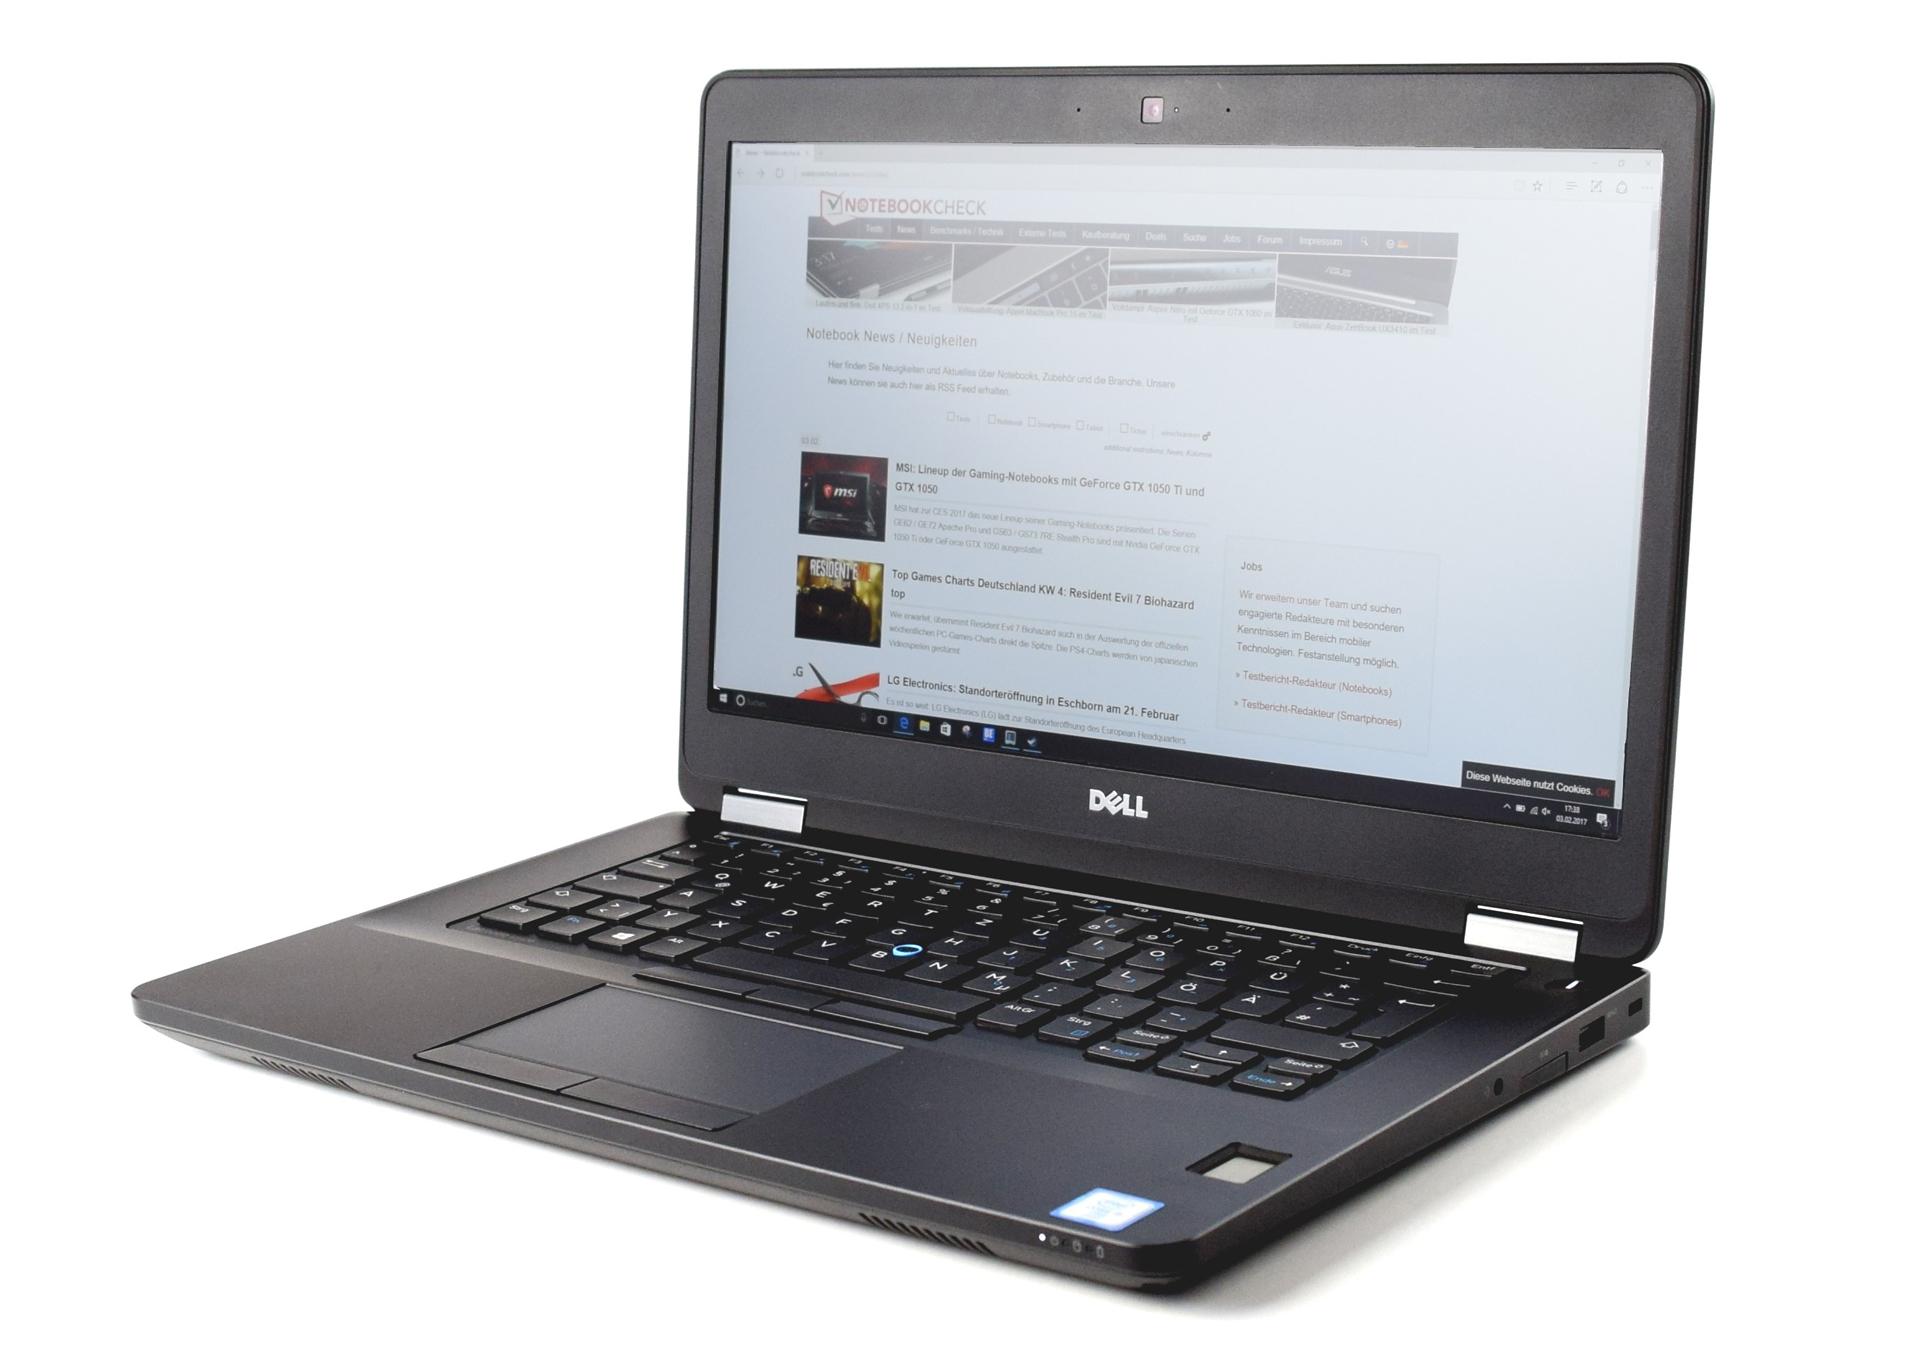 HP Pavilion g6t-2300 CTO Realtek Card Reader Windows 8 X64